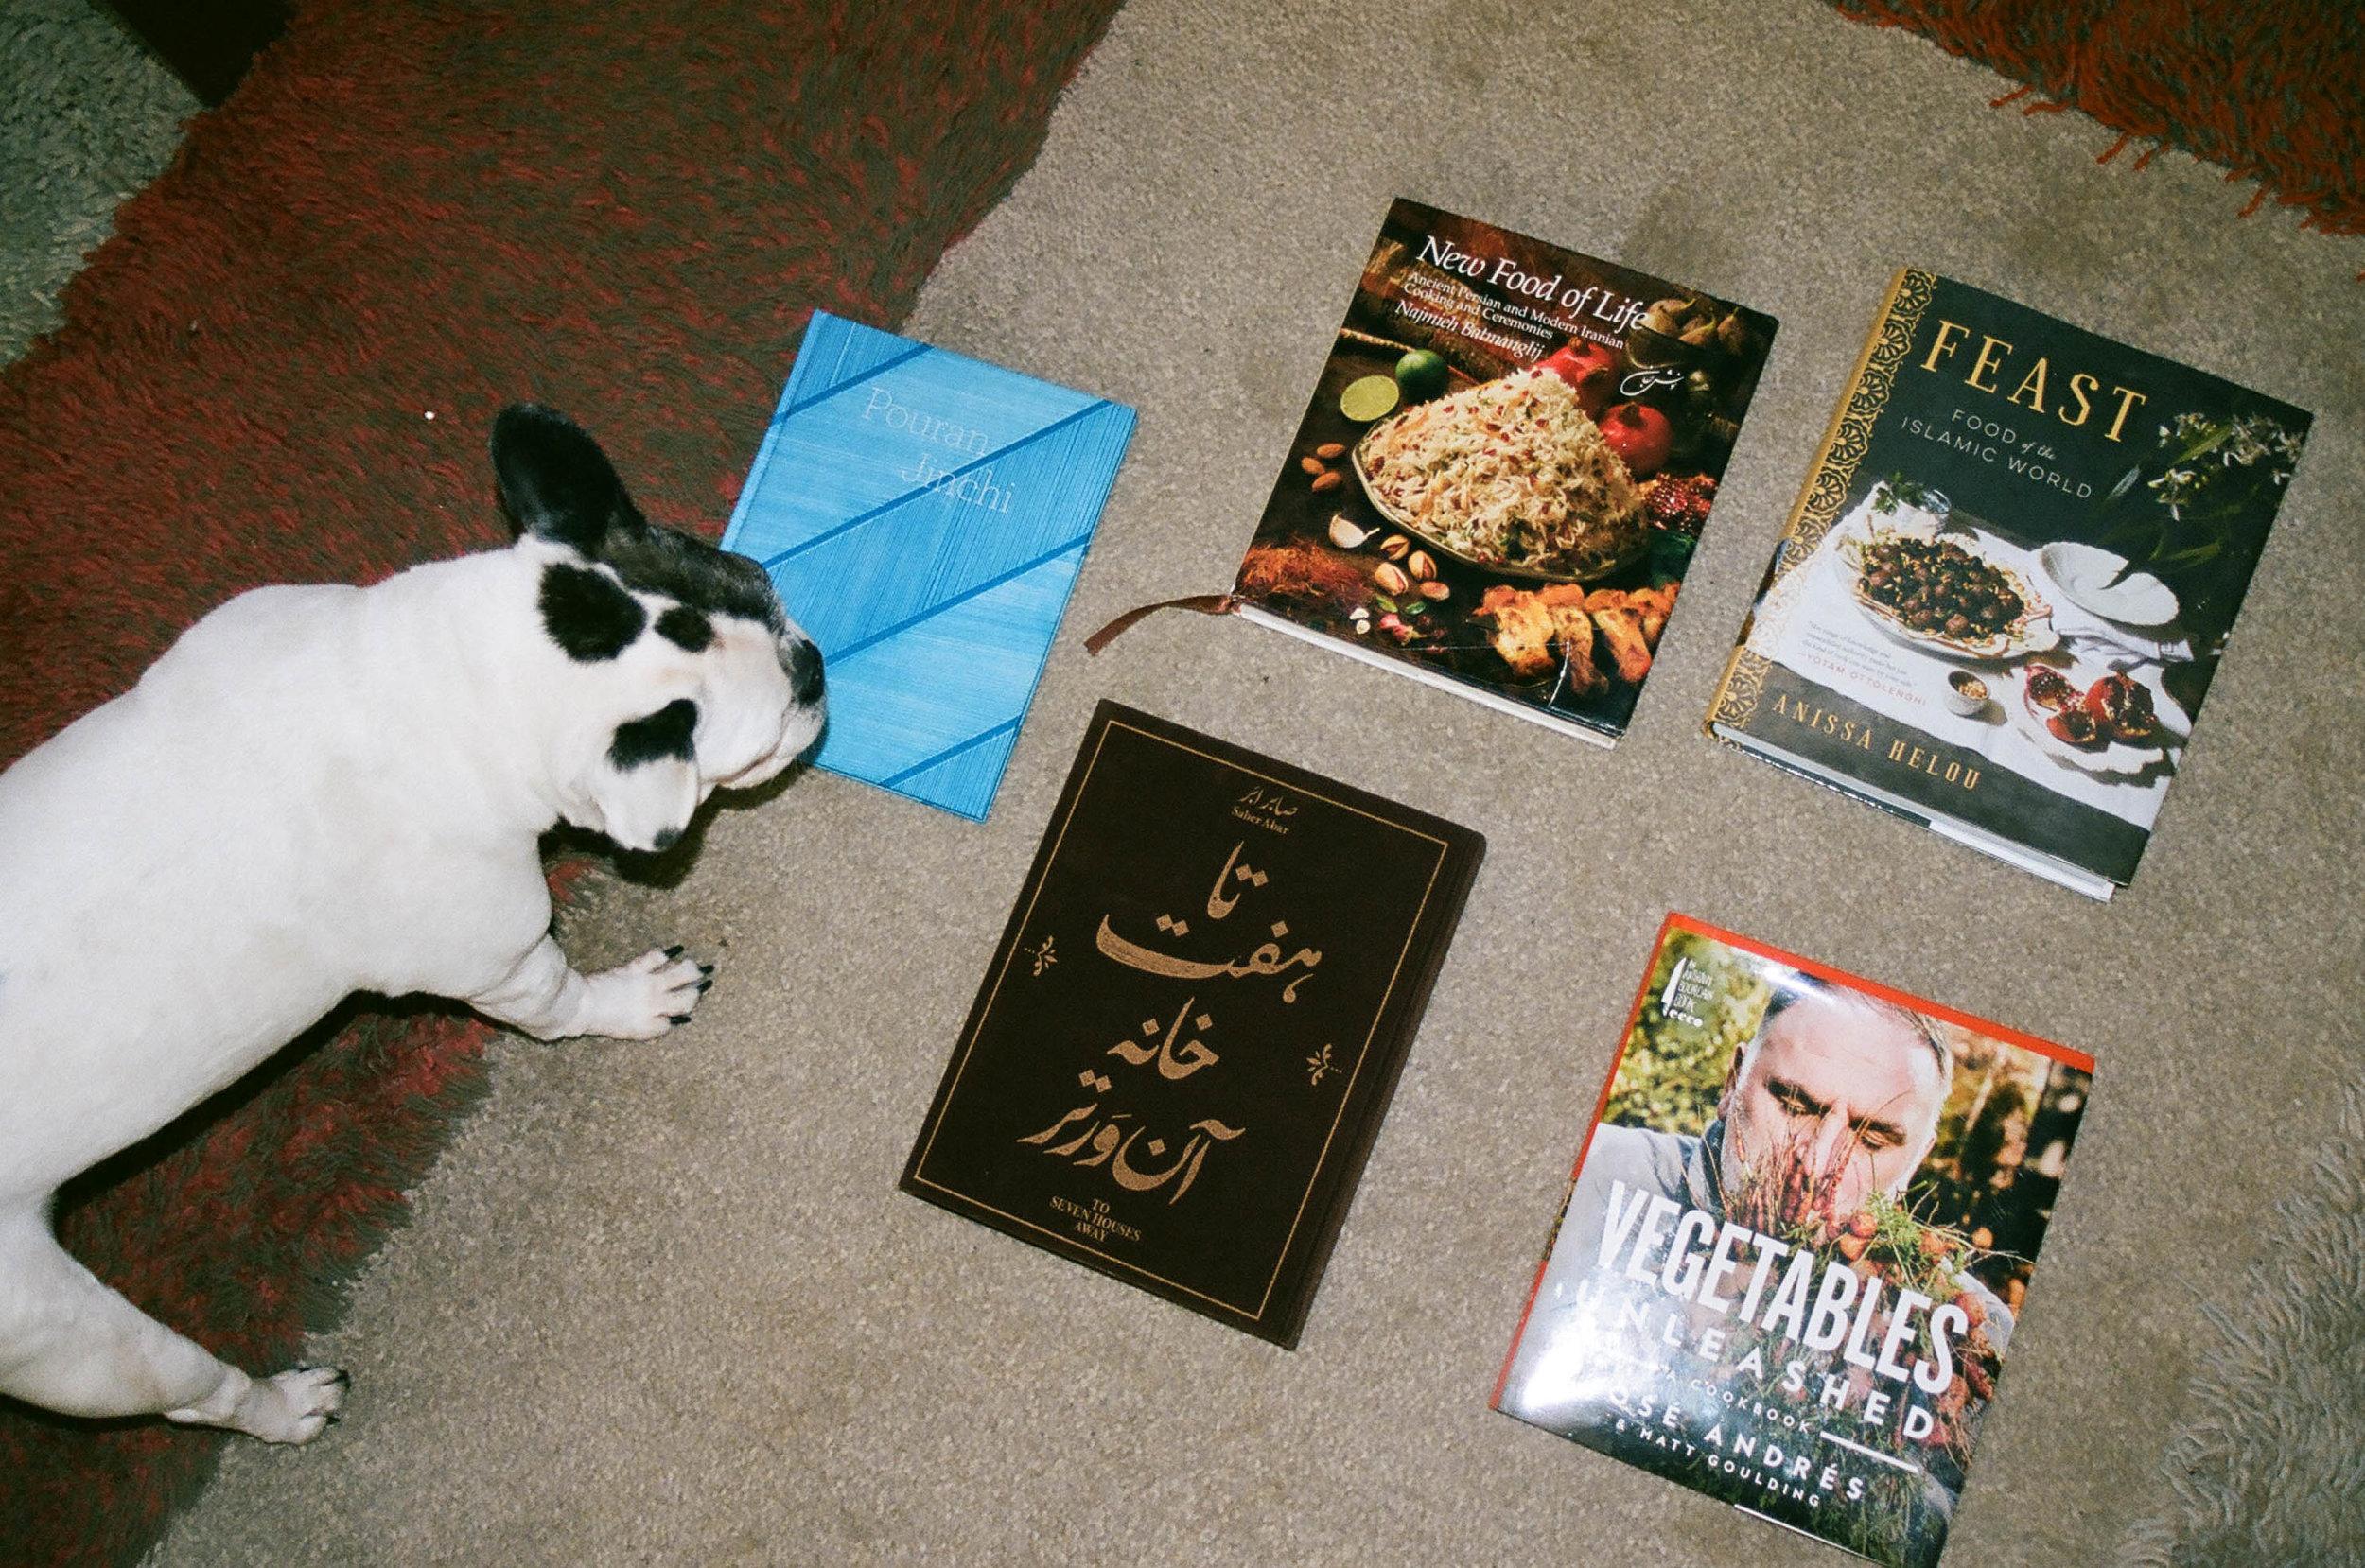 Nasim's favorite books